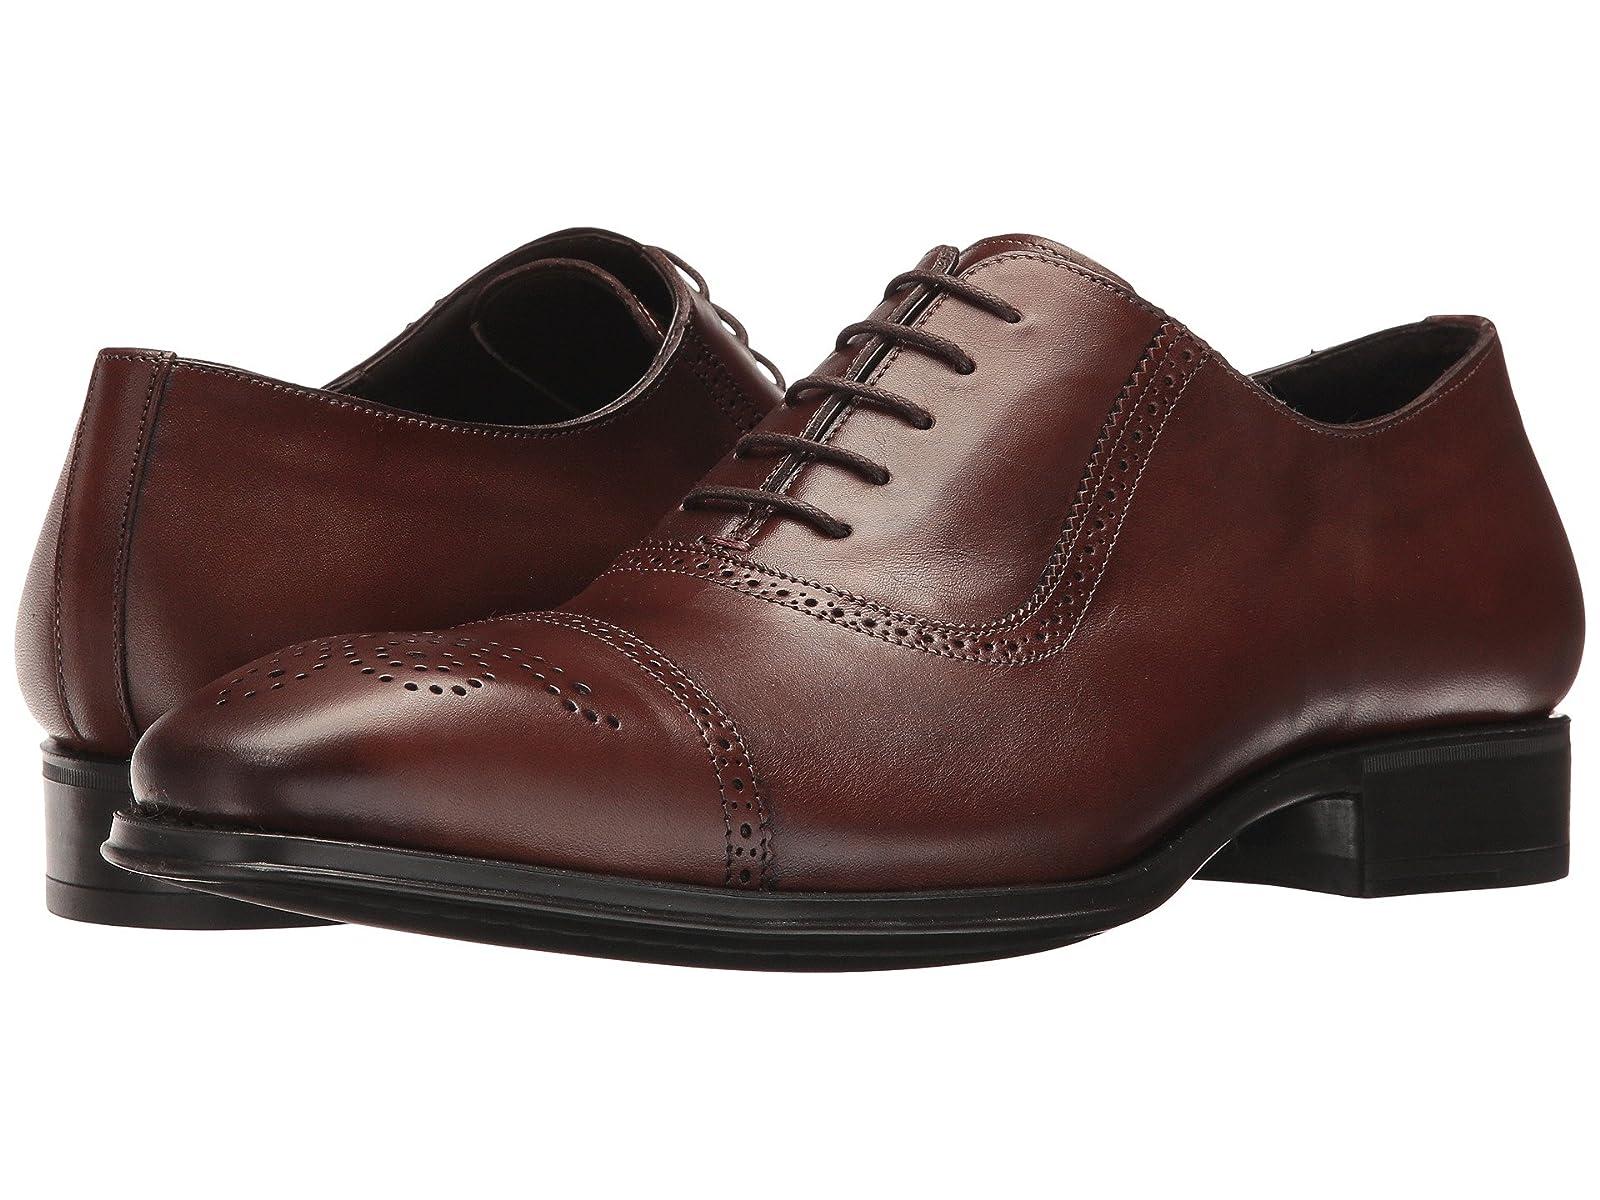 Mezlan MontalvoAtmospheric grades have affordable shoes